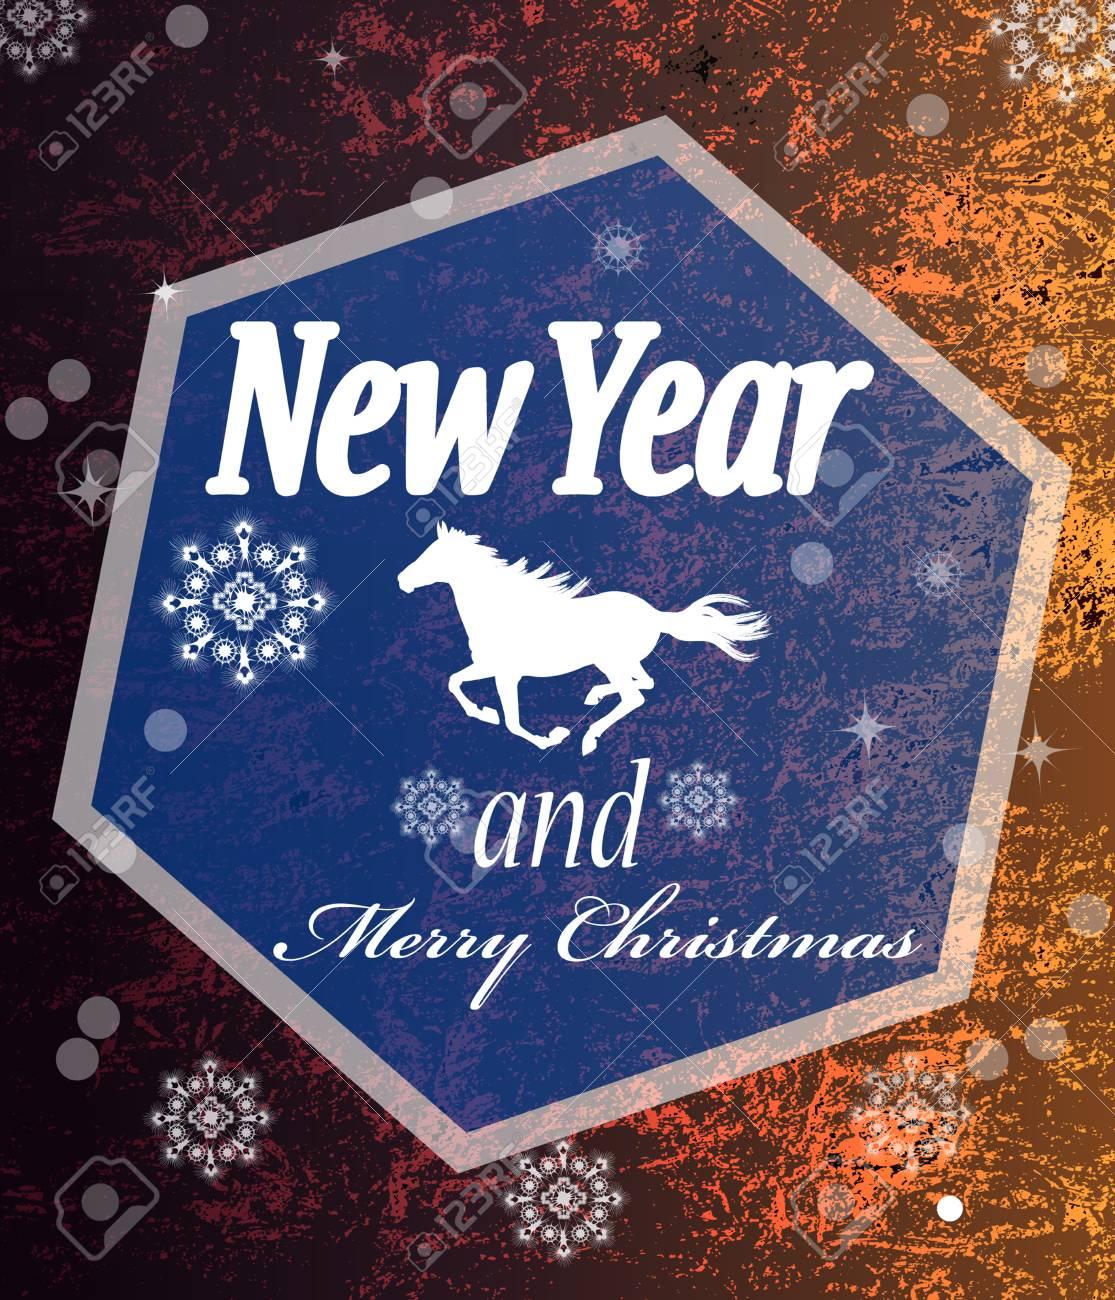 The New Year Horse Vintage retro vector Christmas card Stock Vector - 22381382